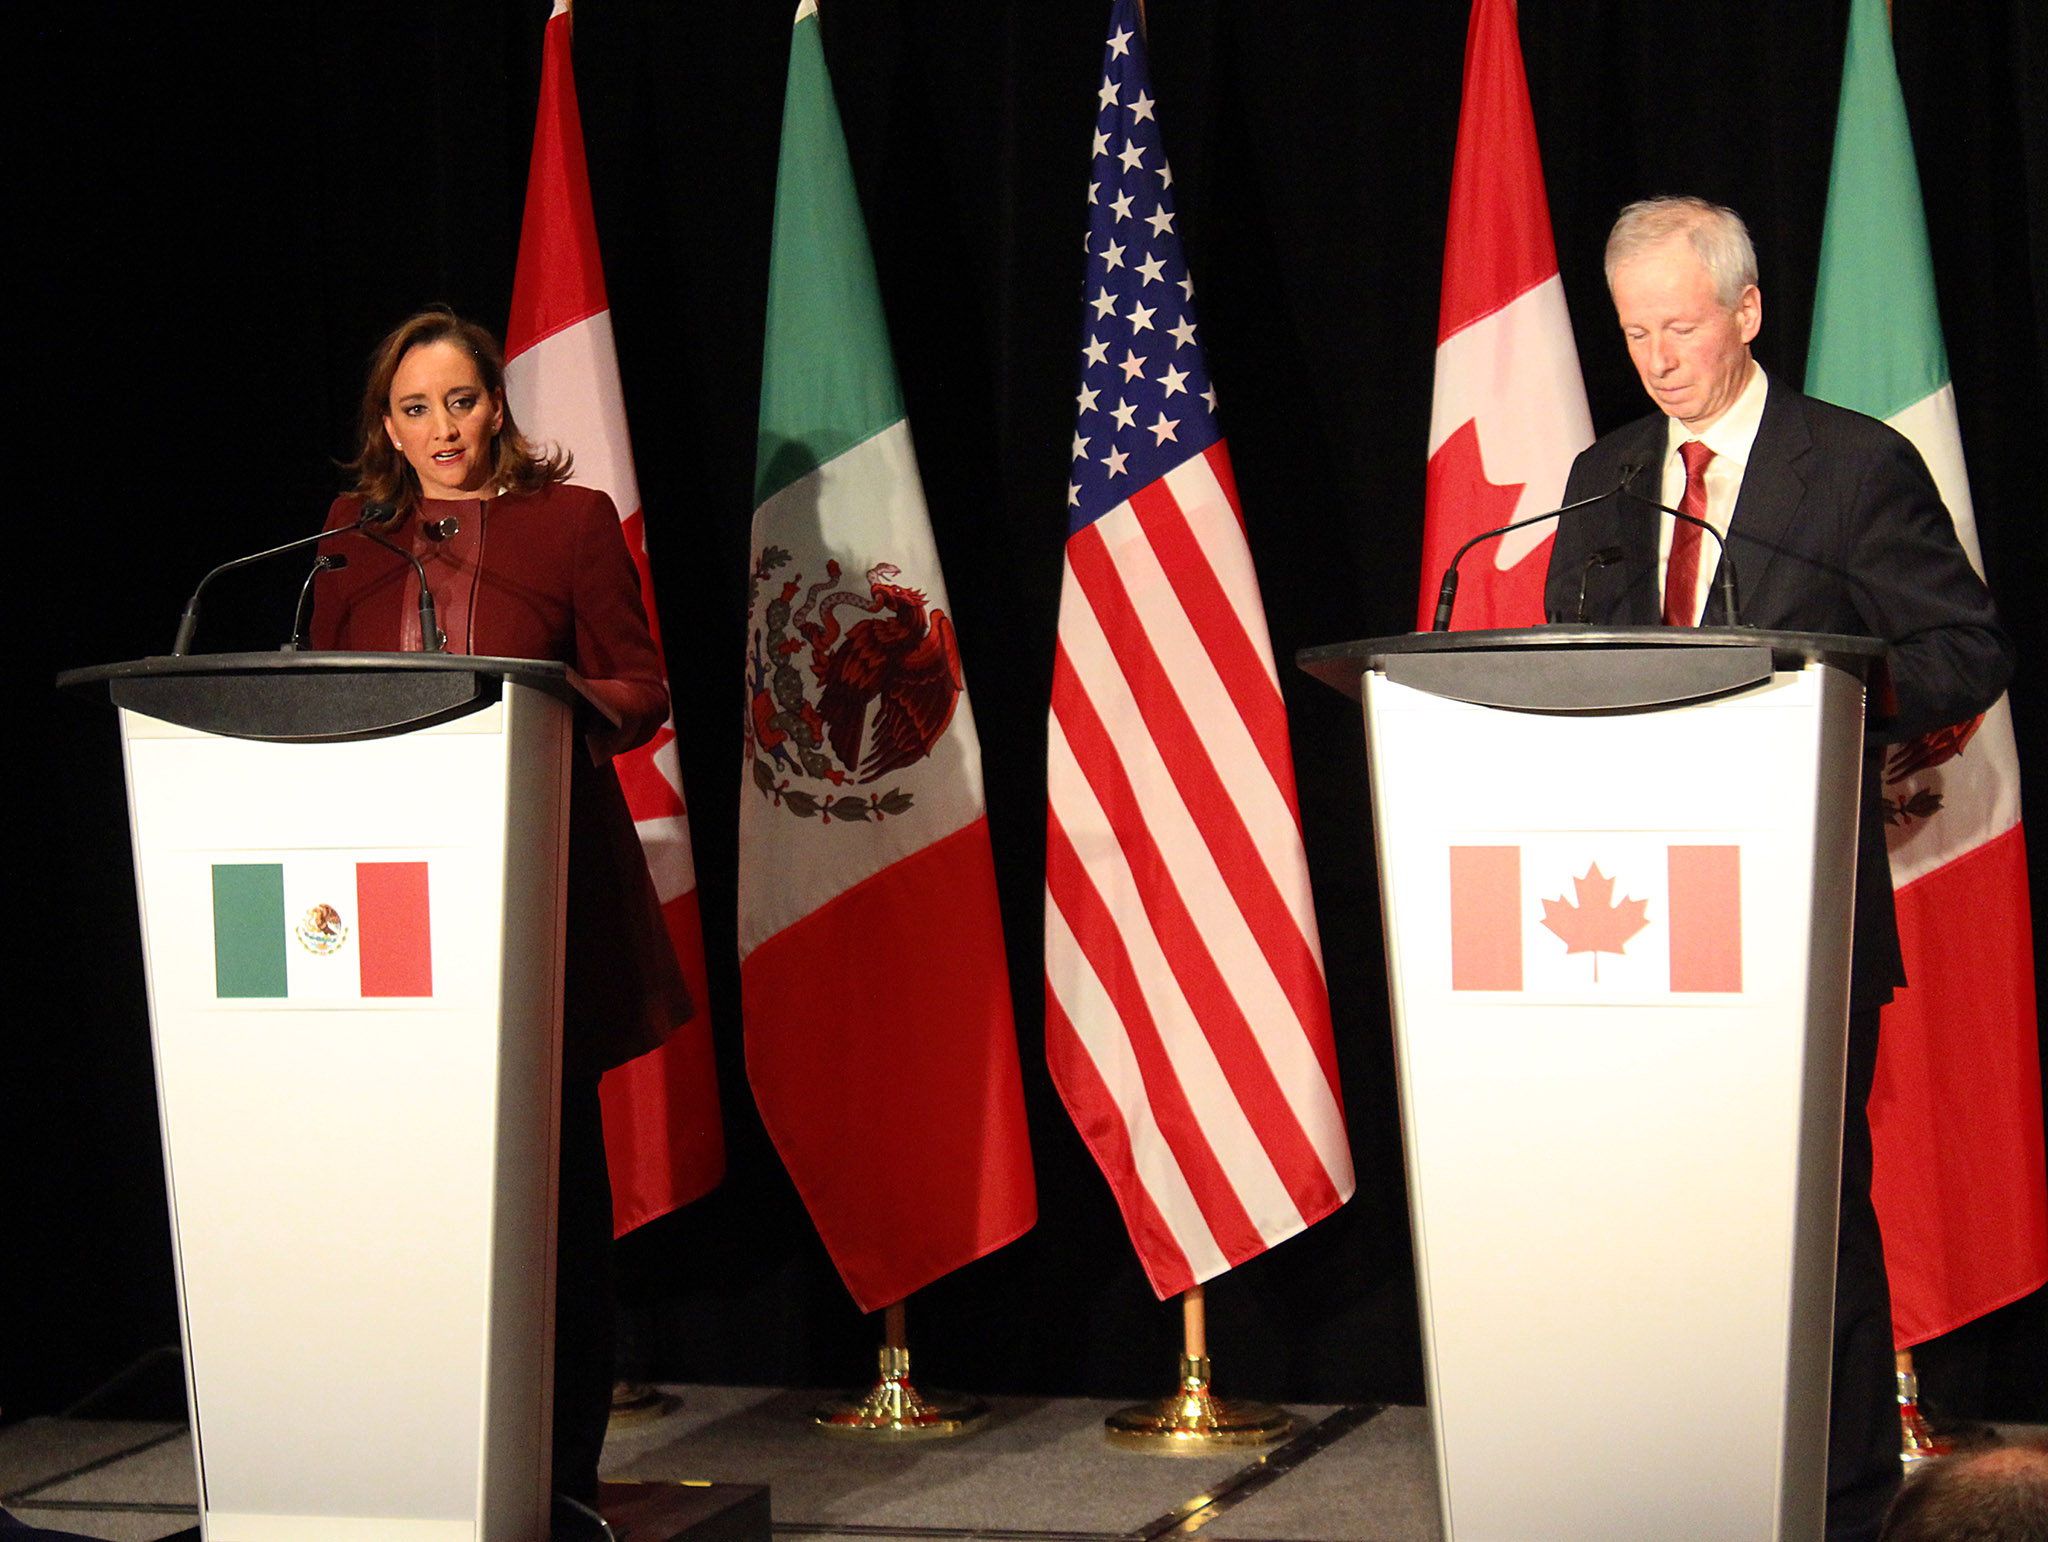 FOTO 3 Canciller Claudia Ruiz Massieu y el Ministro de Exteriores de Canad   St phan Dion.jpg